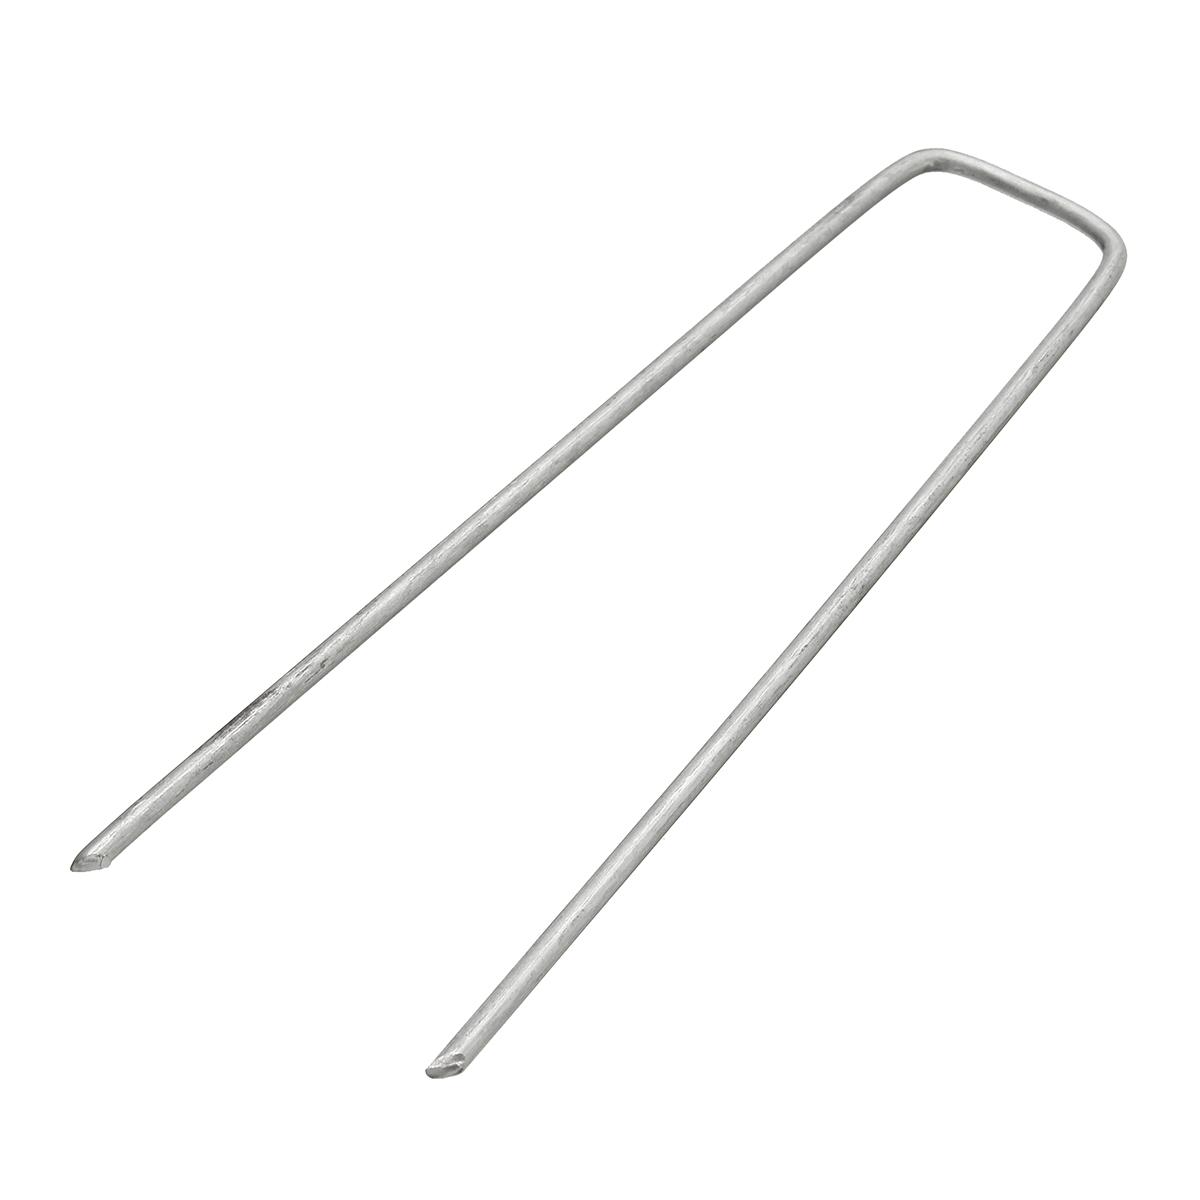 10Pcs Artificial Grass Turf Pegs Silver U Shape Metal Pins